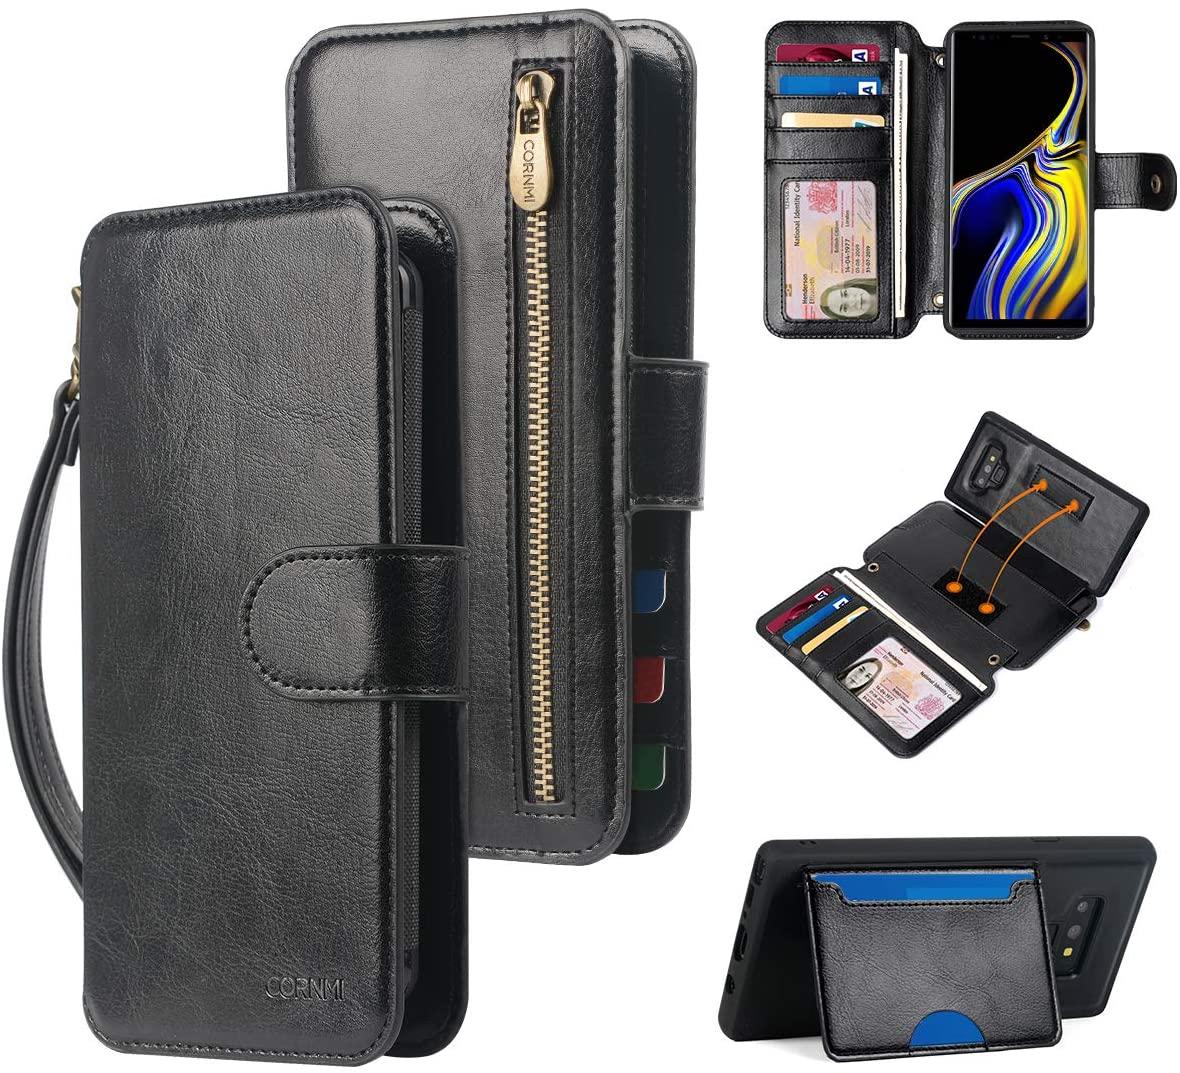 CORNMI Samsung Galaxy Note 9 Wallet Case, Zipper Pocket Strap Detachable Kickstand, Flip Cover Leather Folio Purse Protective Magic Sticker with Card Holder- Black